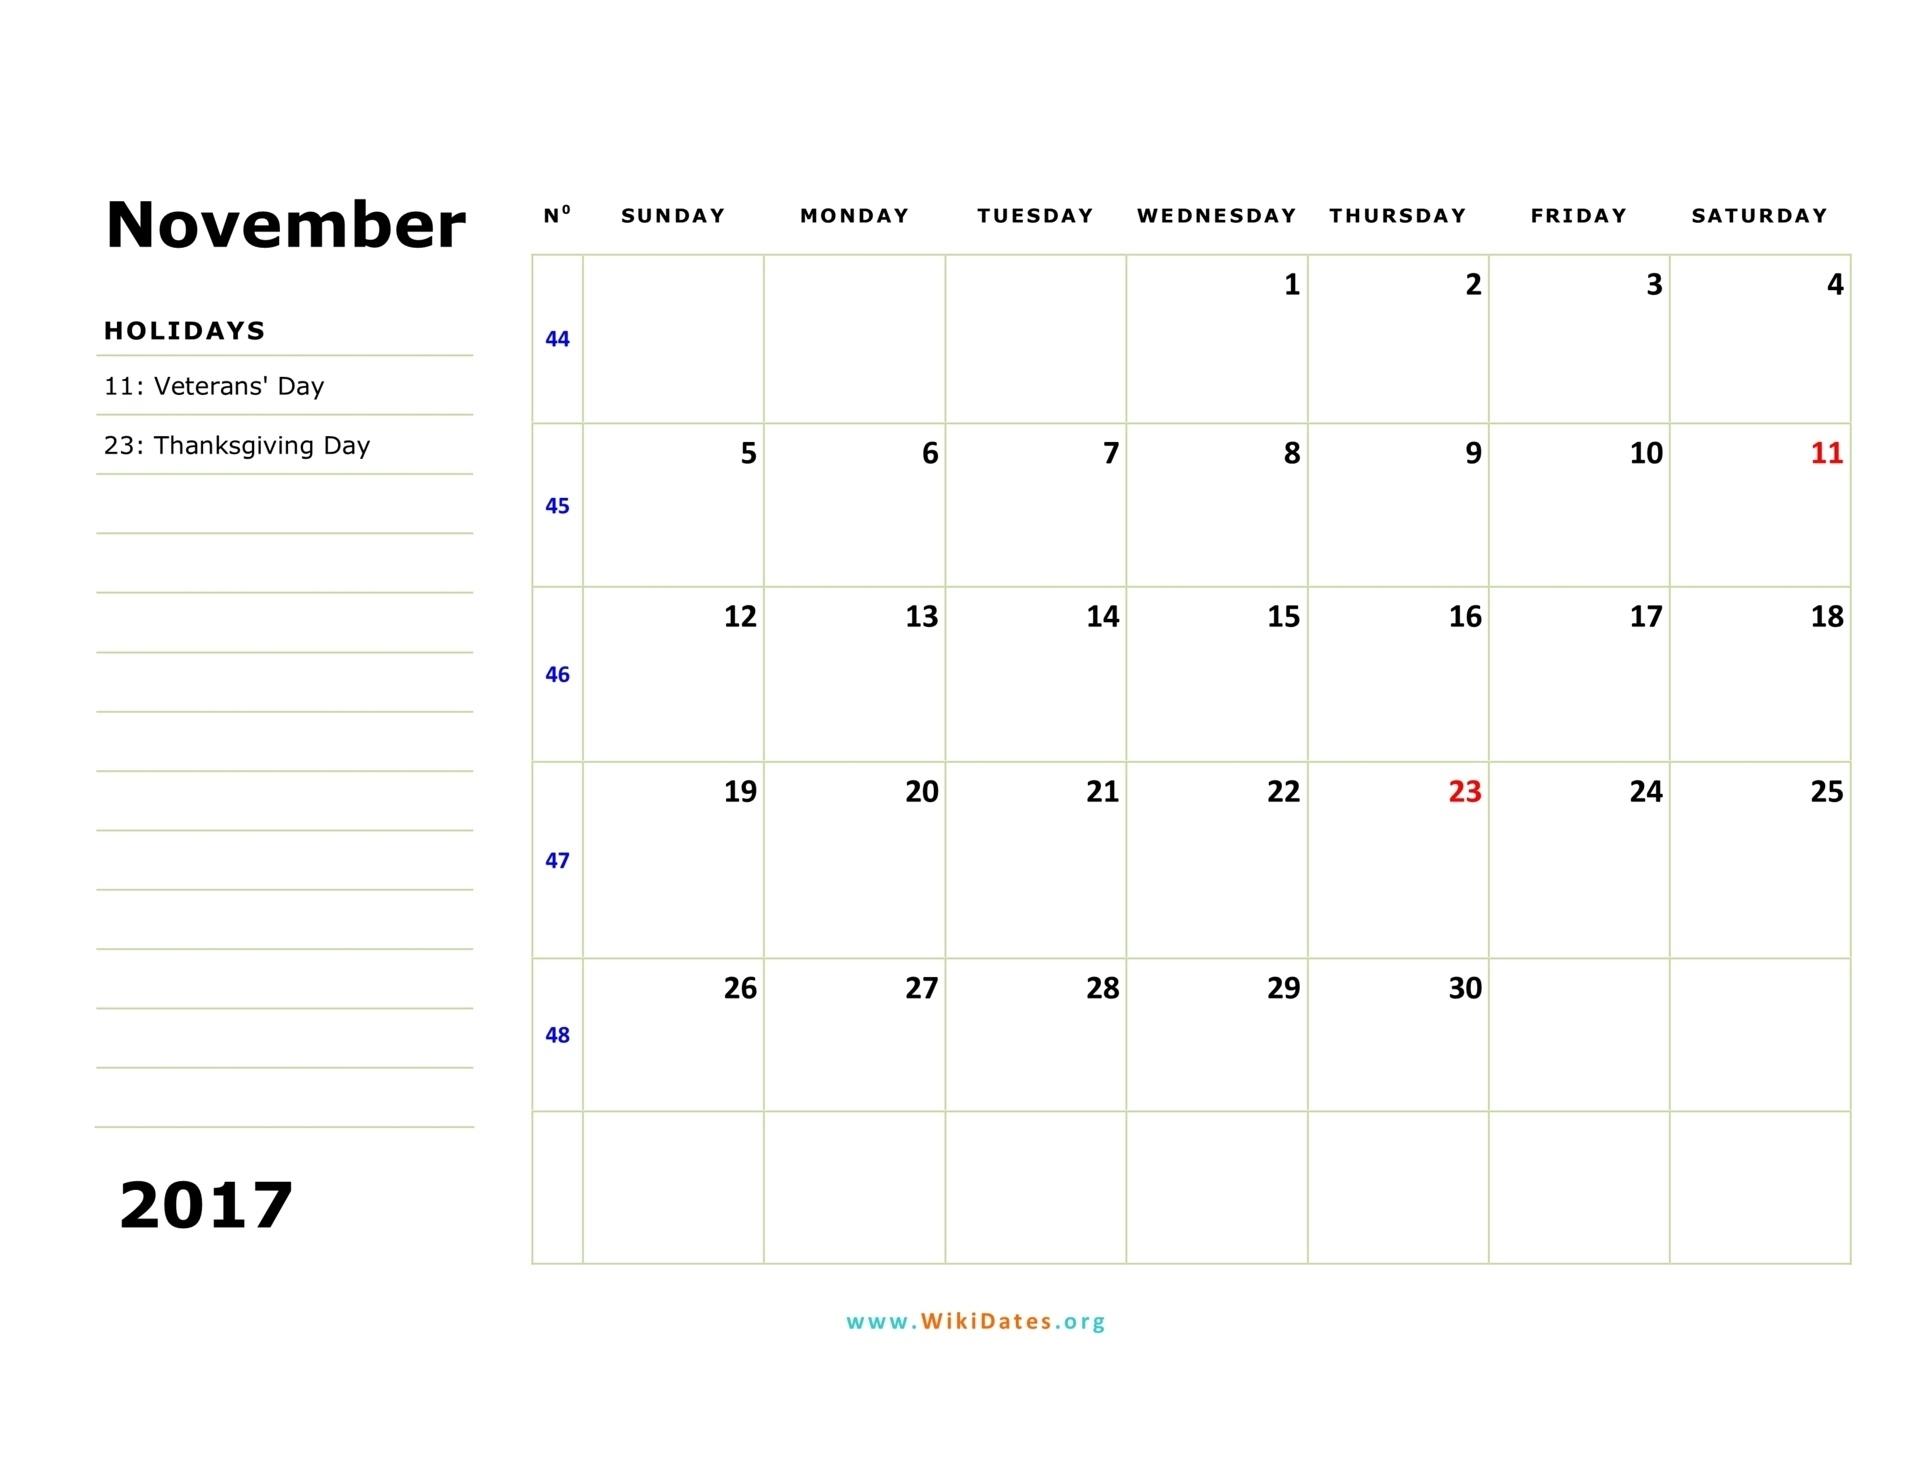 November 2017 Calendar | Wikidates  Weekly Calandar Template Starting Monday